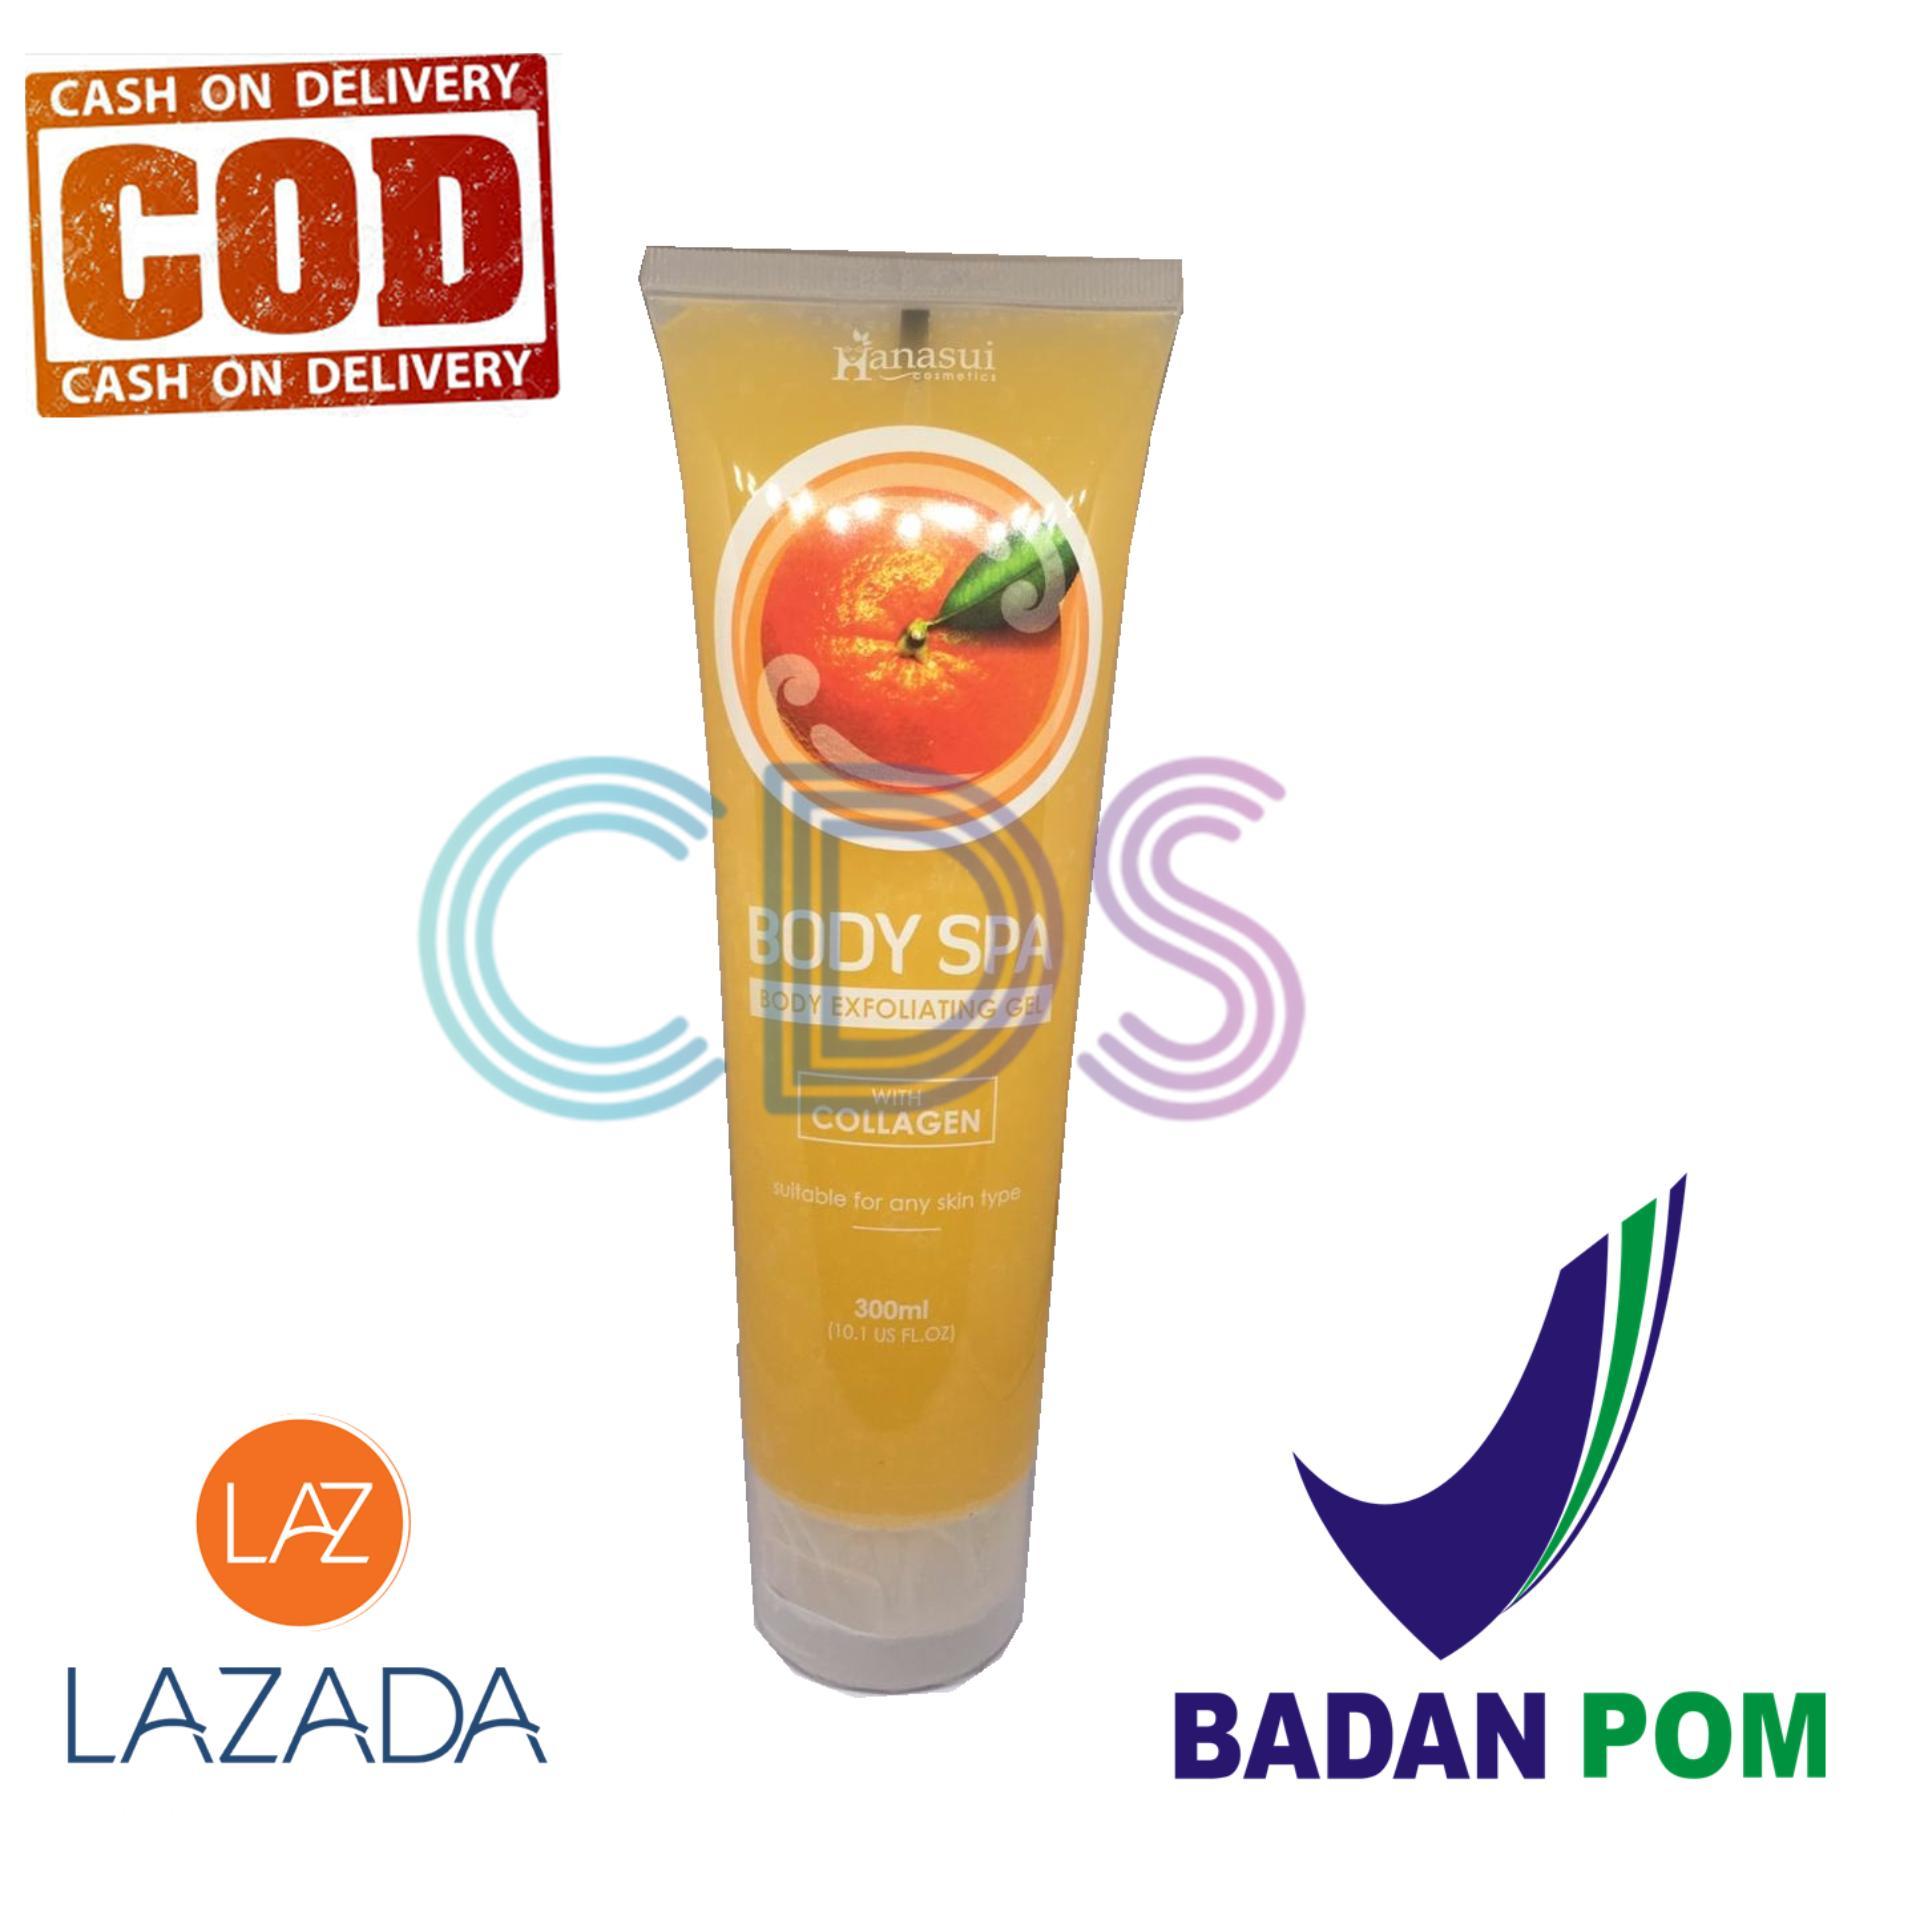 Jual Produk Hanasui Online Terbaru Di Hanasuiii Body Spa Exfoliating Gel With Collagen Peeling Perontok Daki Orange